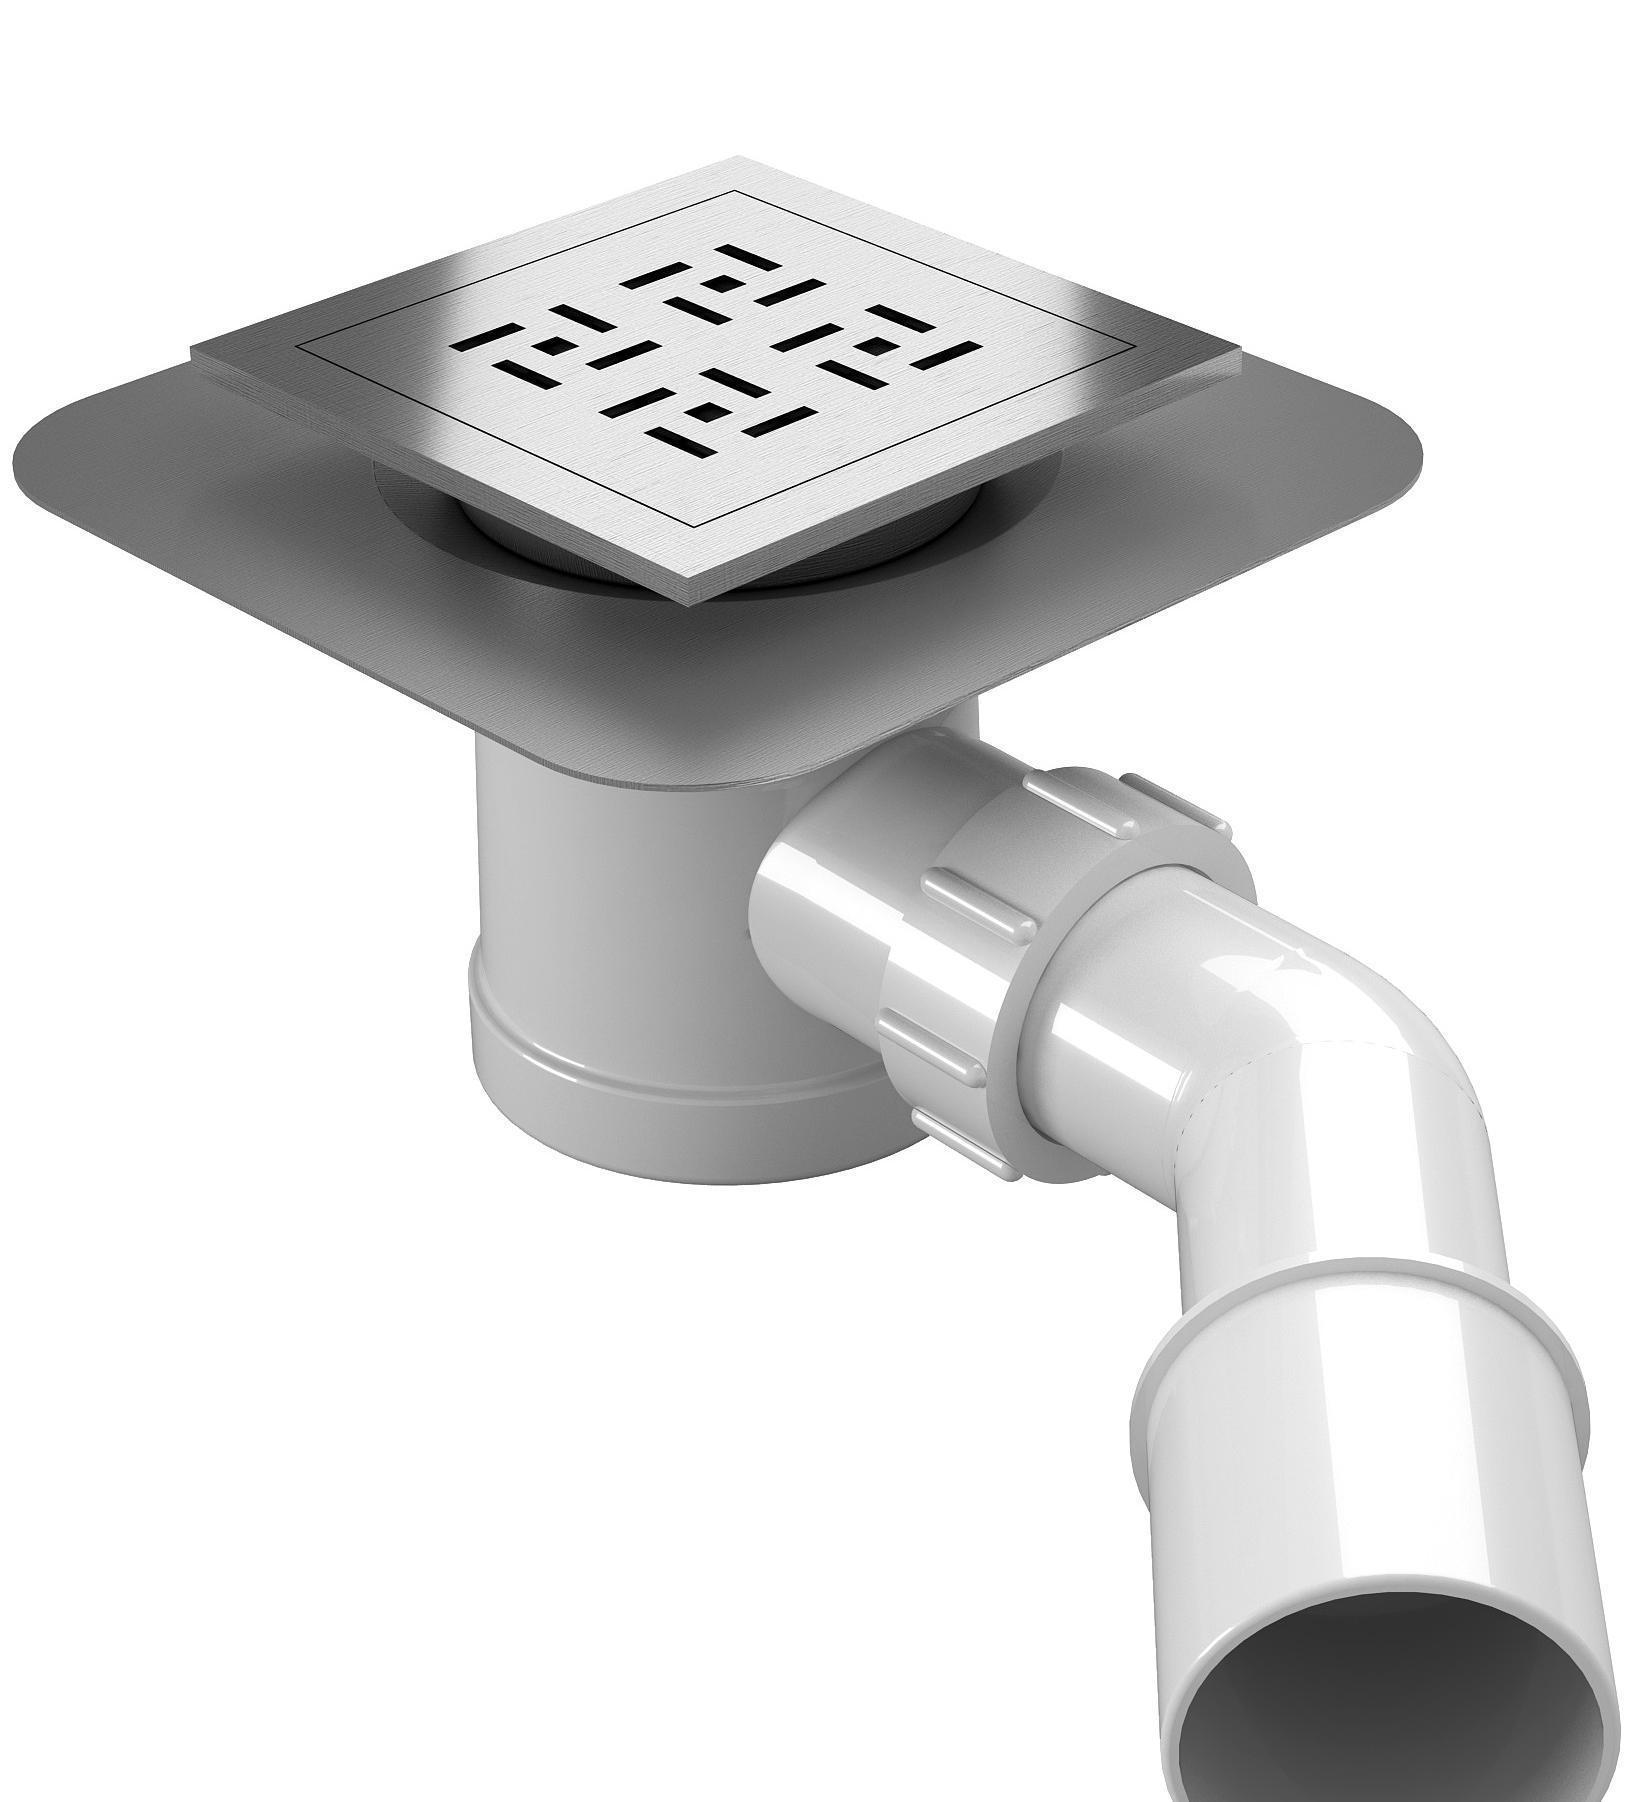 WIPER wpust Punktowy Premium 10 cm TIVANO